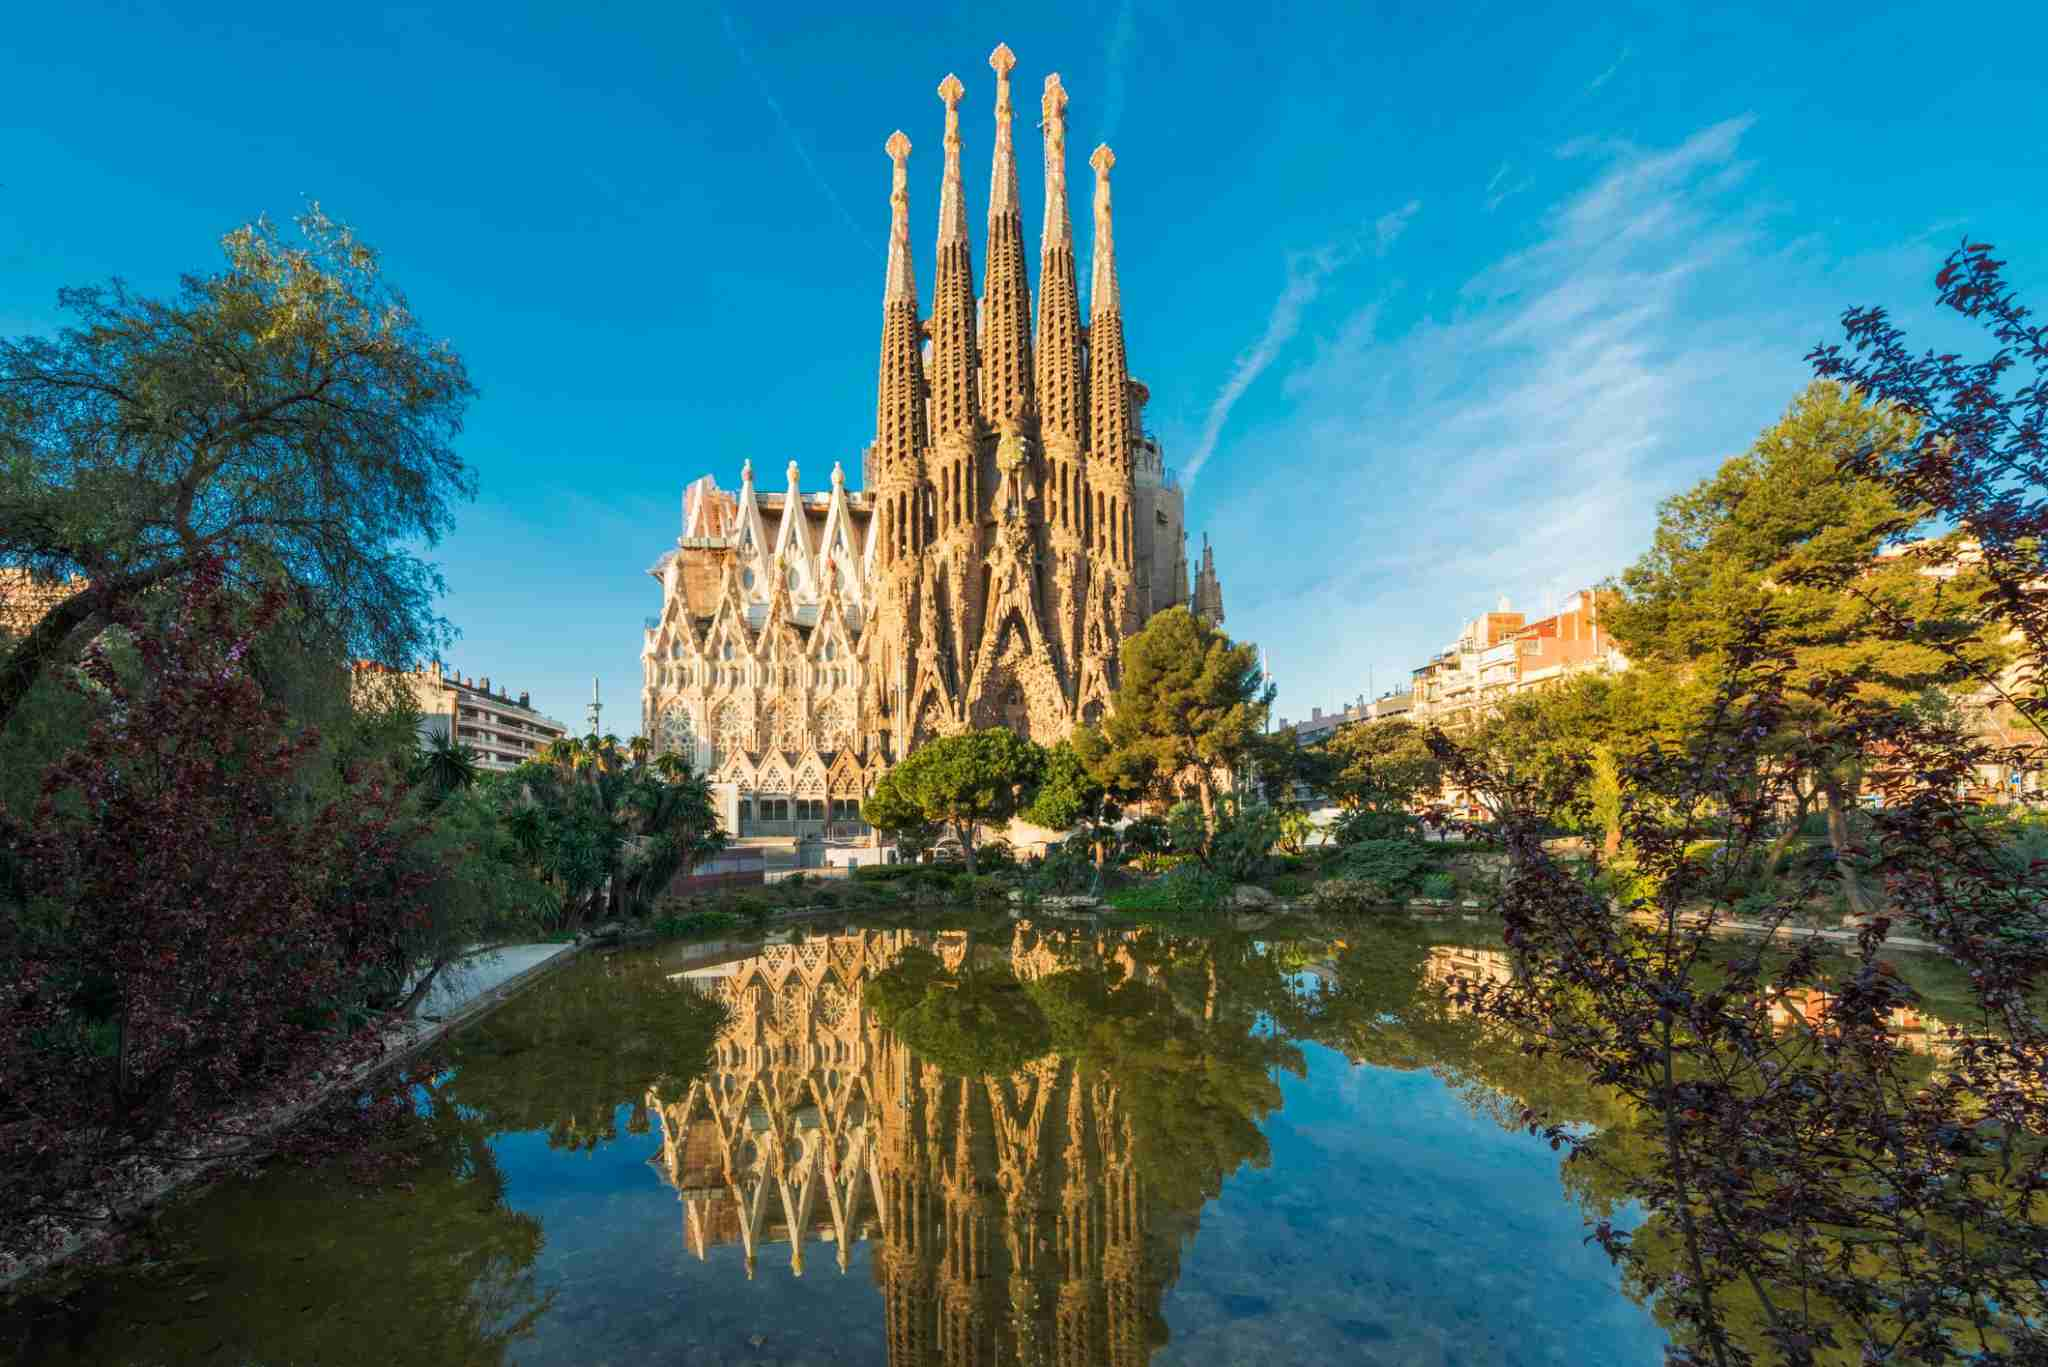 Sagrada Familia (Photo by Tanatat pongphibool ,thailand/Getty Images)